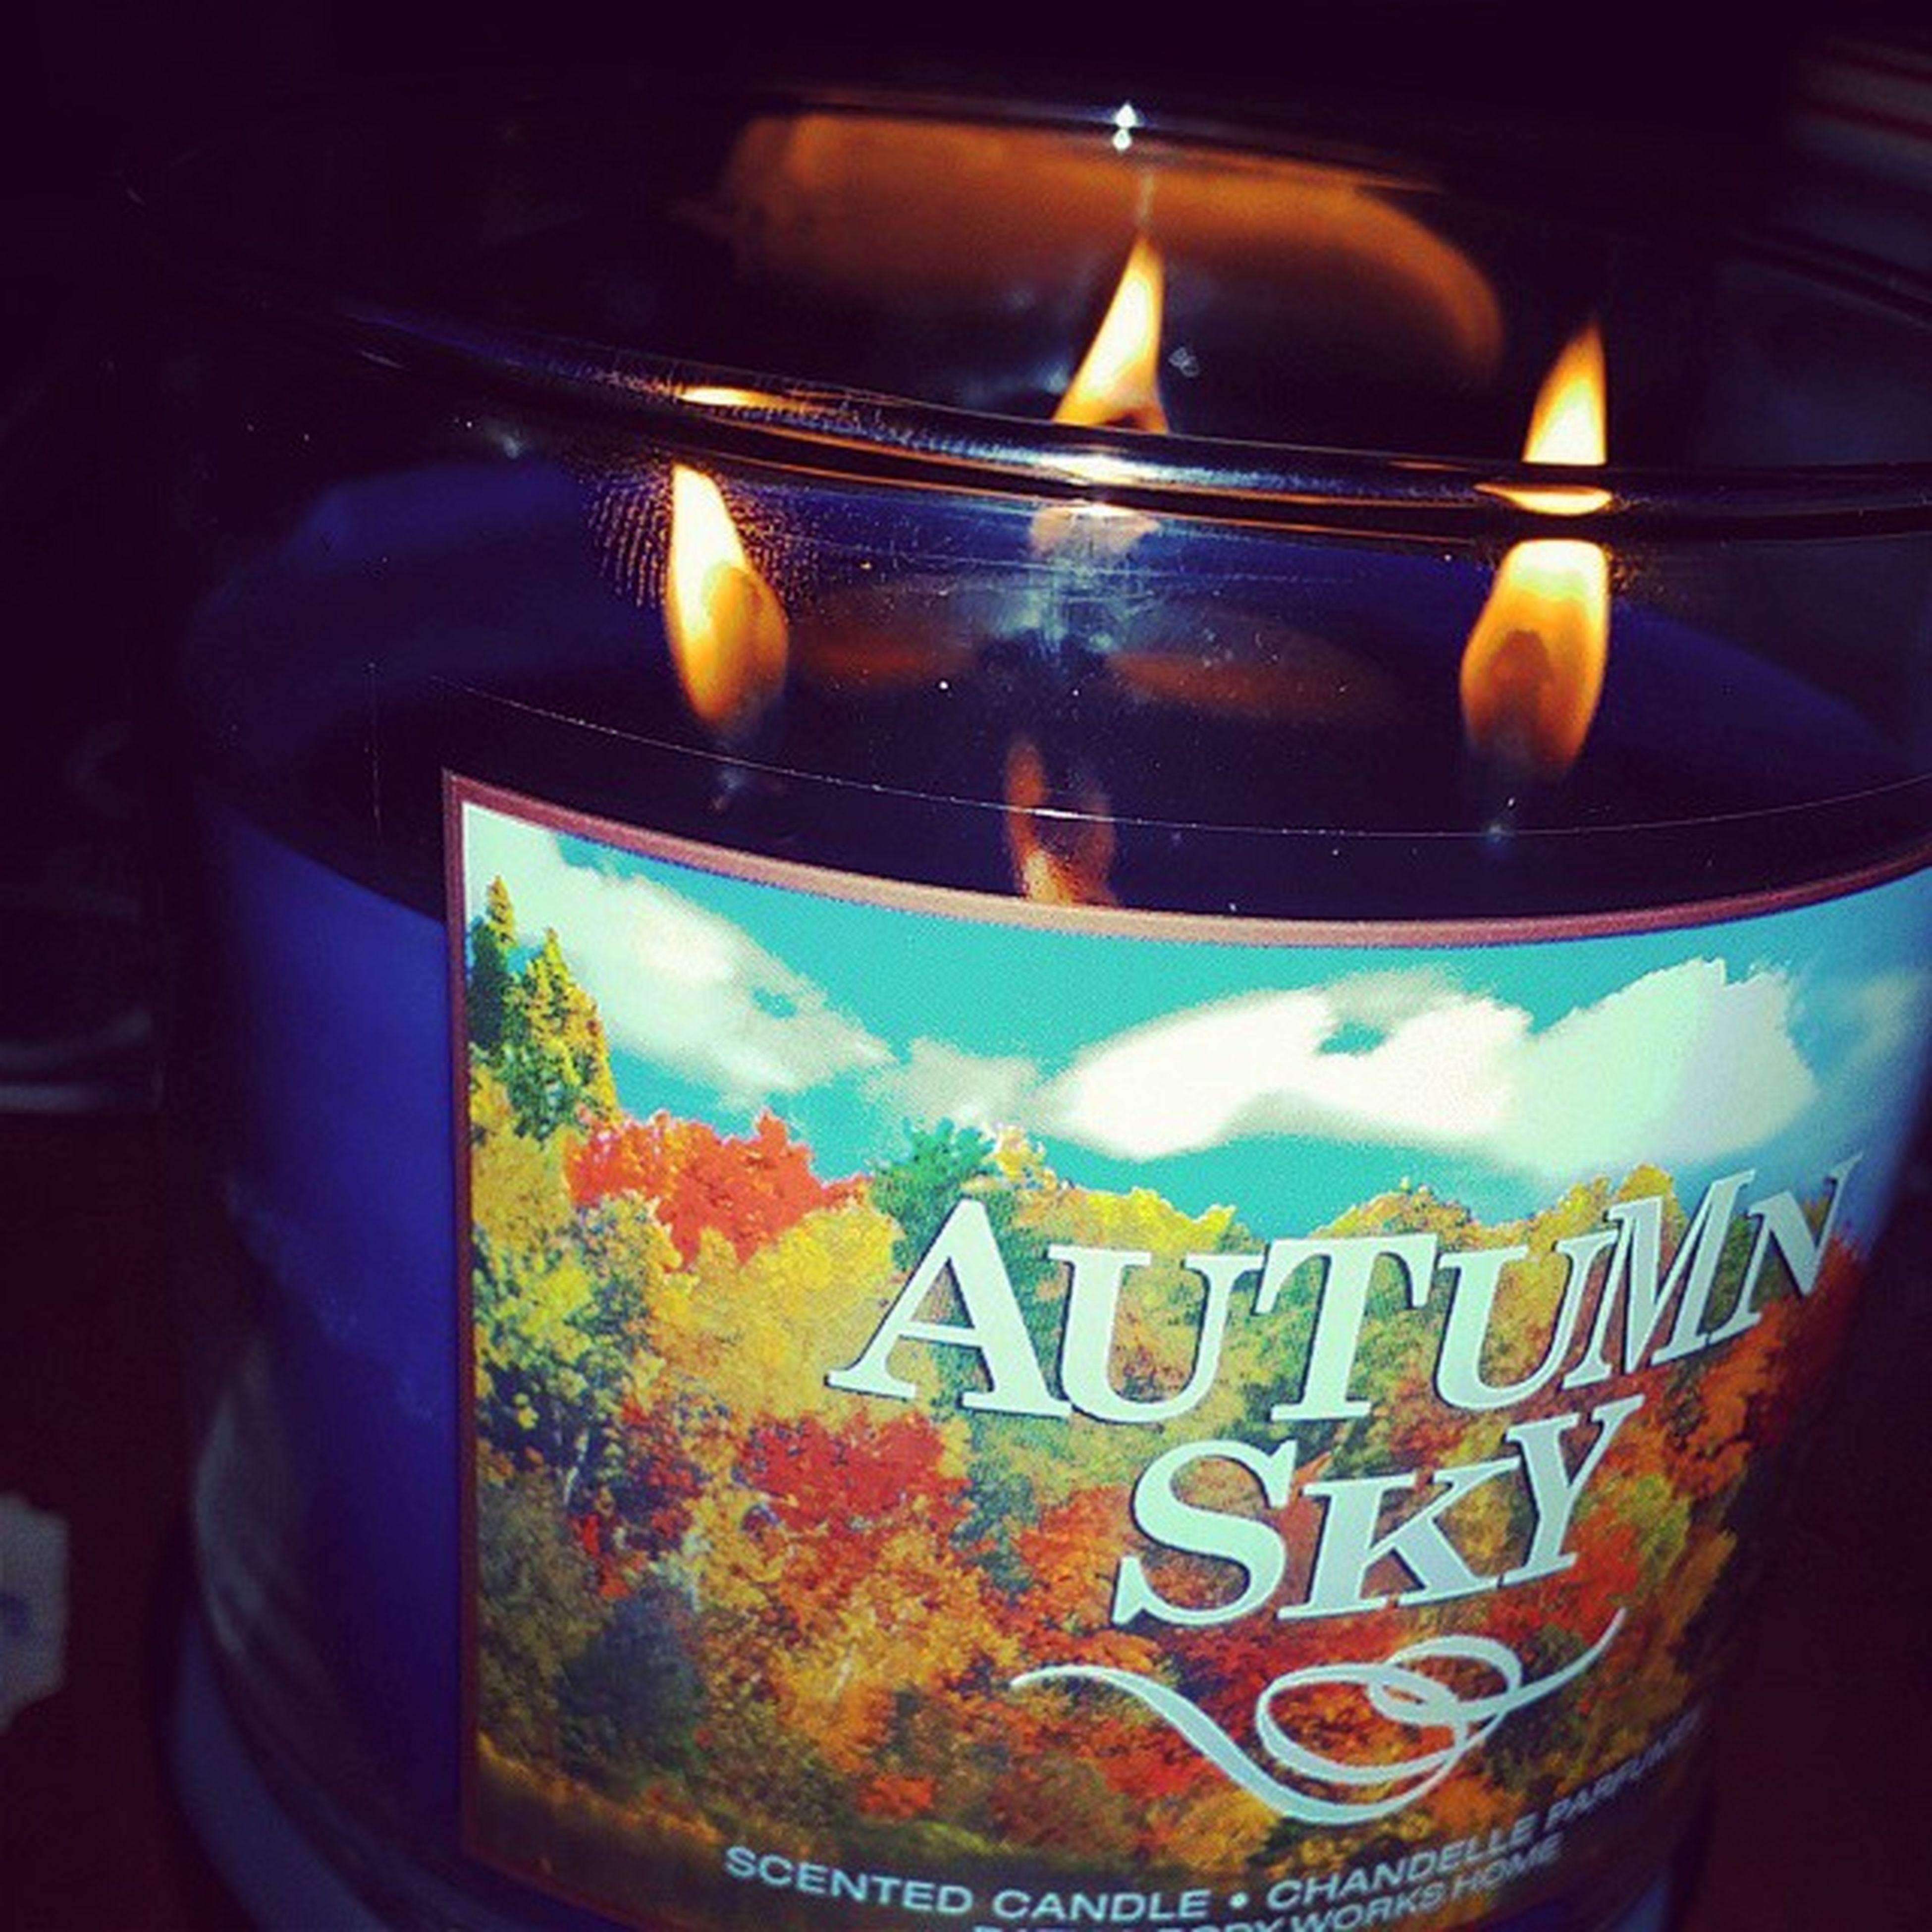 Bathandbodyworks autumn sky. Random Igismylife Allofthepictures allofthetime loveit gay gaylife like allofthehashtags areyoustillreadingthese stopreadingthem theydontmeananything theydontknowweknowtheyknow hashtag